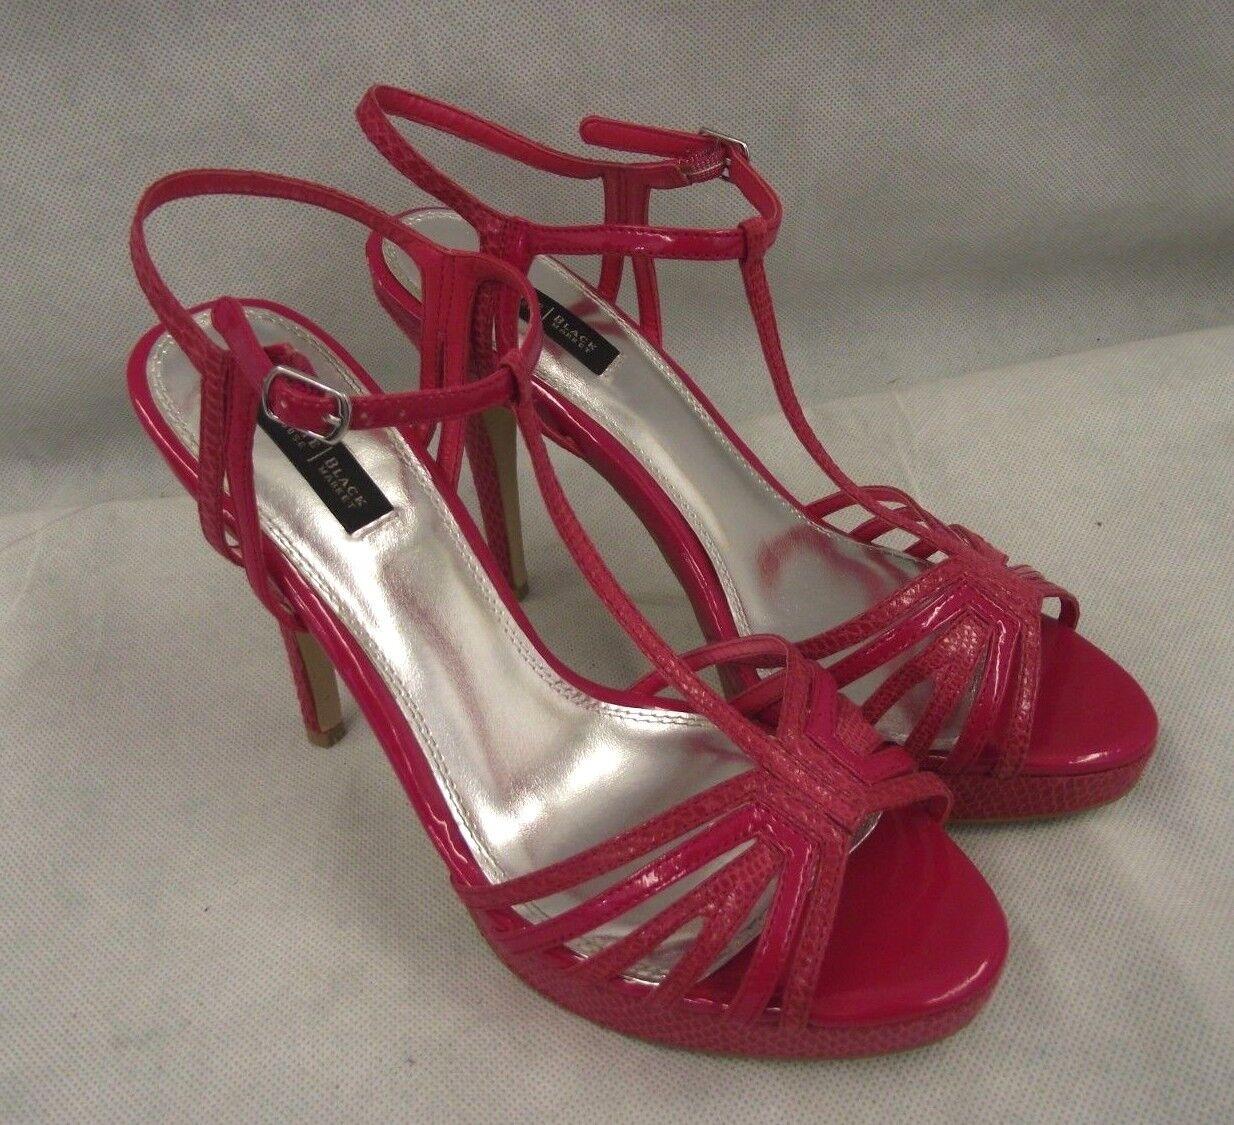 White House Black Market Sz 9M Shoes Sandals 'Genoa' High Heels Hot Pink  EUC